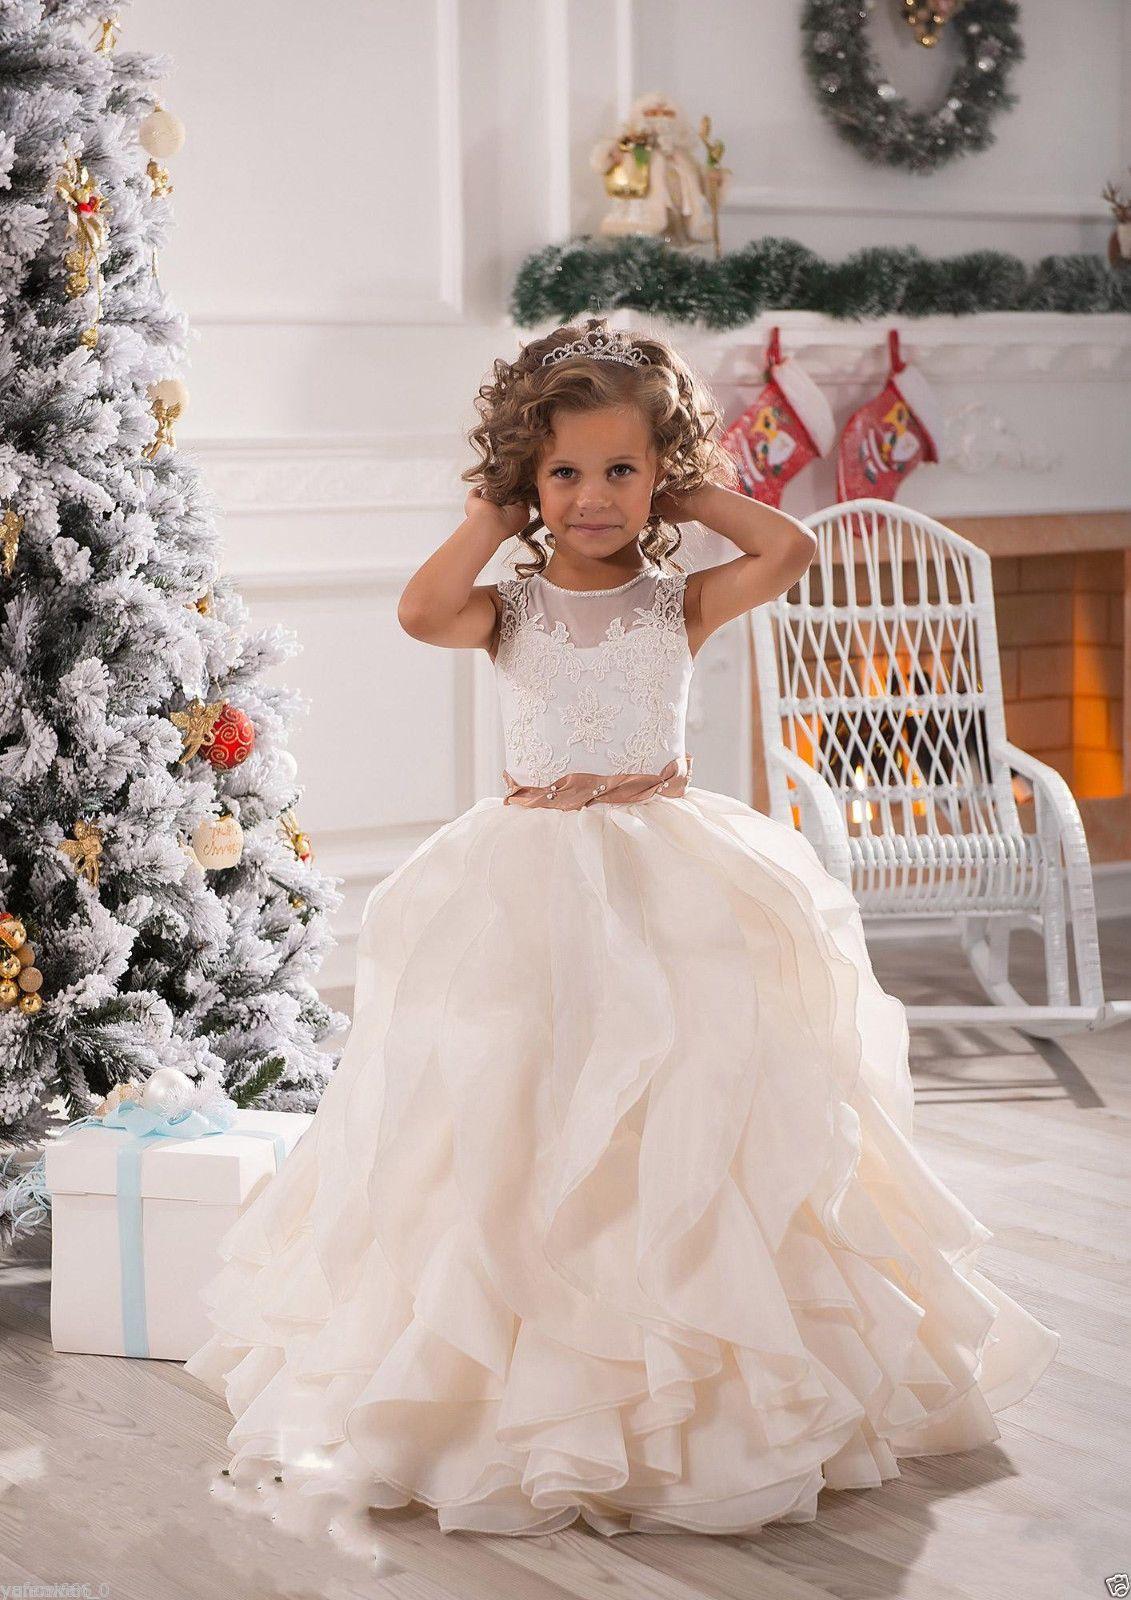 f19e354c8 NEW White IvoryRuffles Wedding Prom Kids Pageant Baby Princess ...